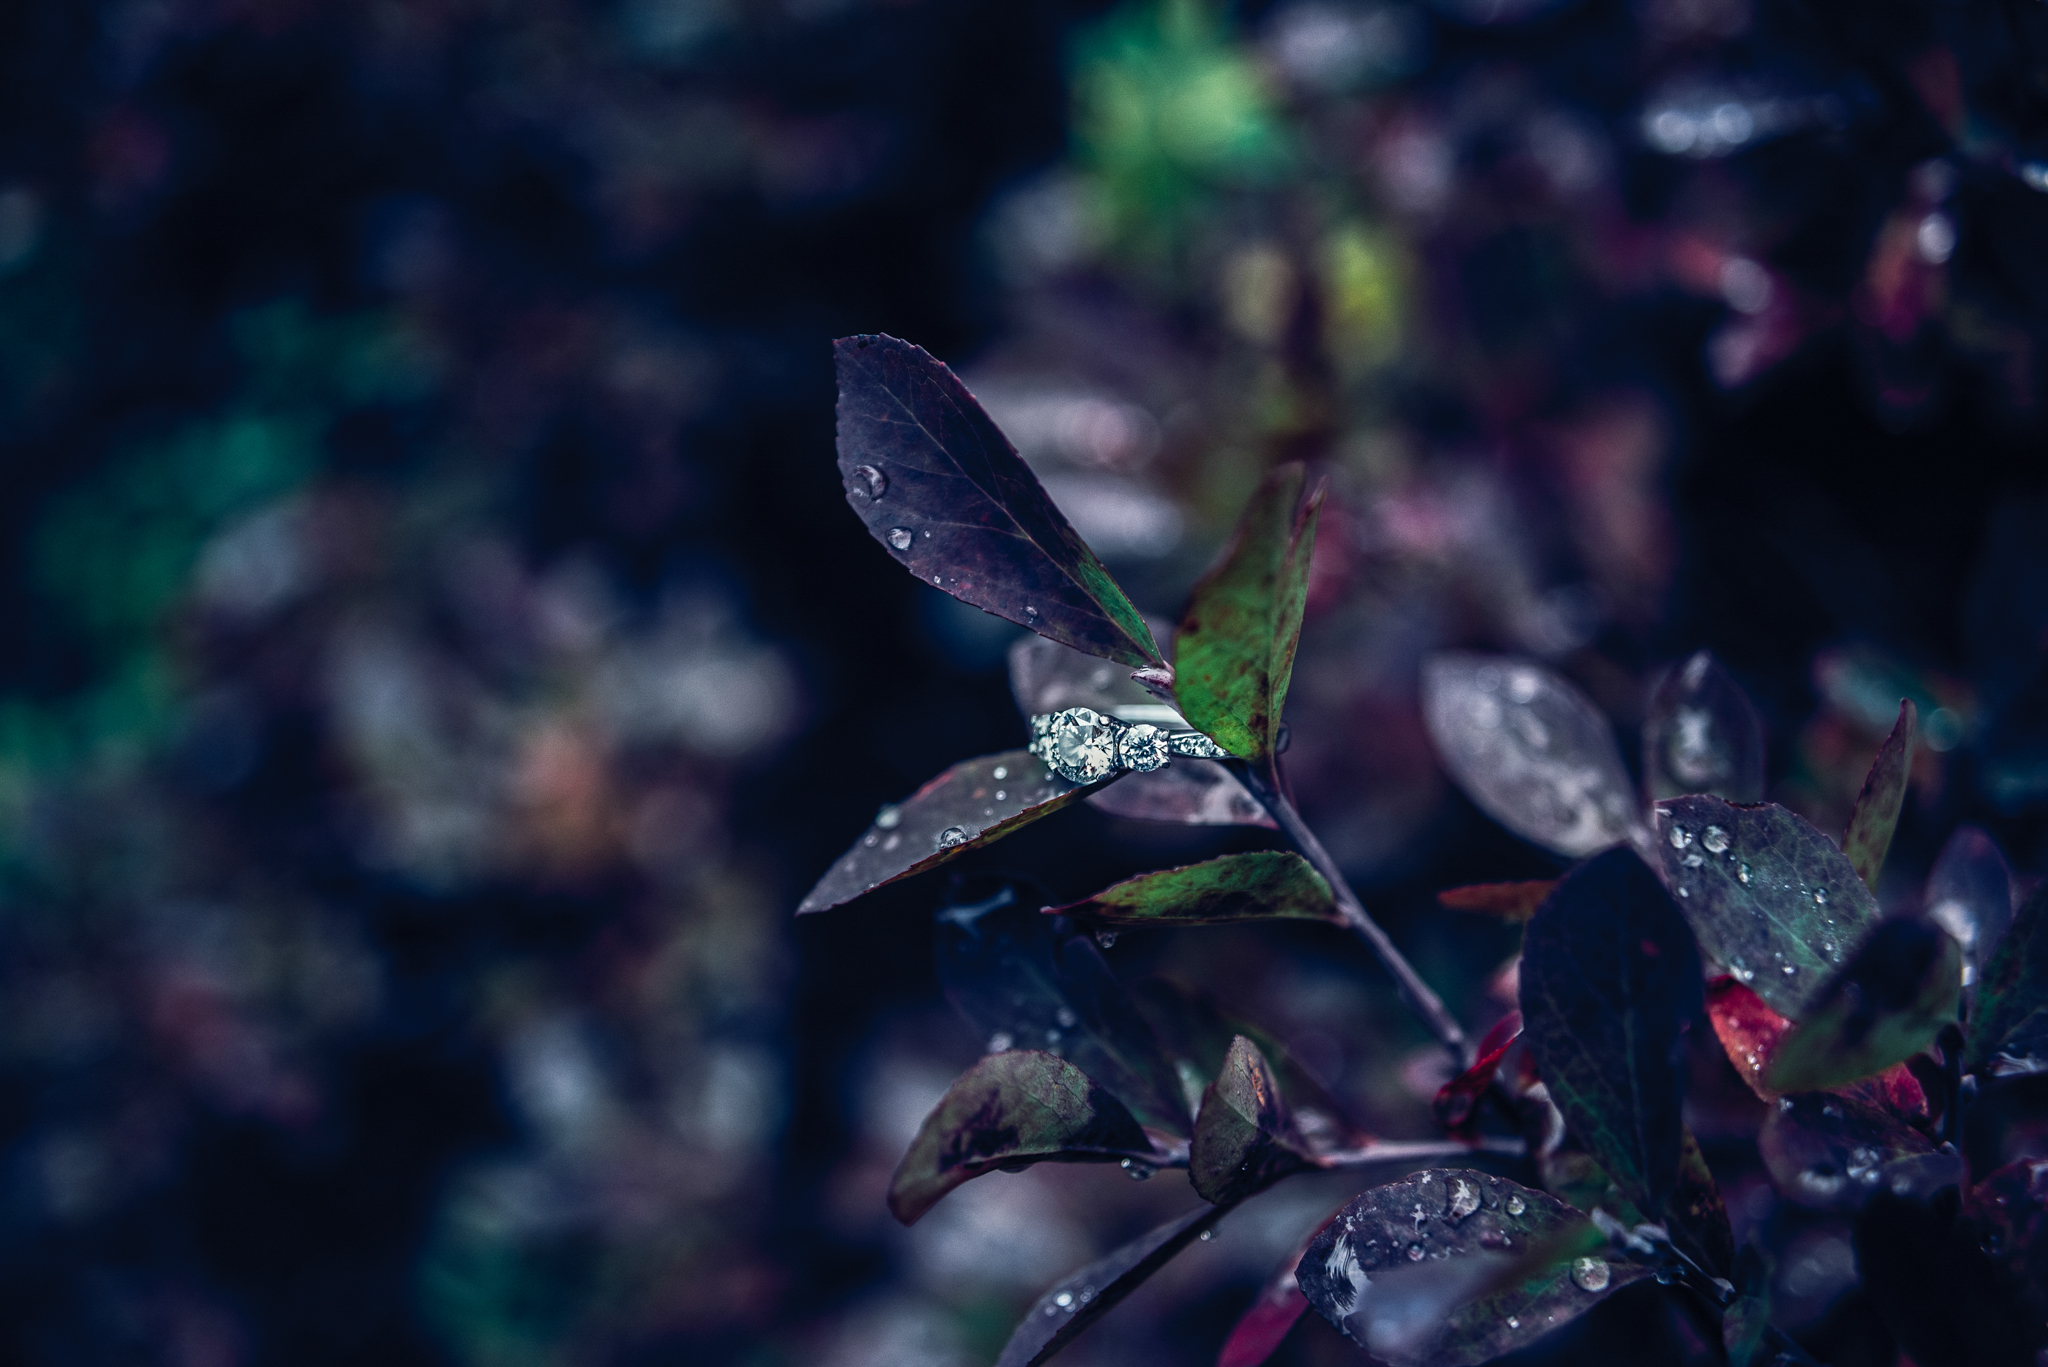 Rainier Engagement-001-3.JPG